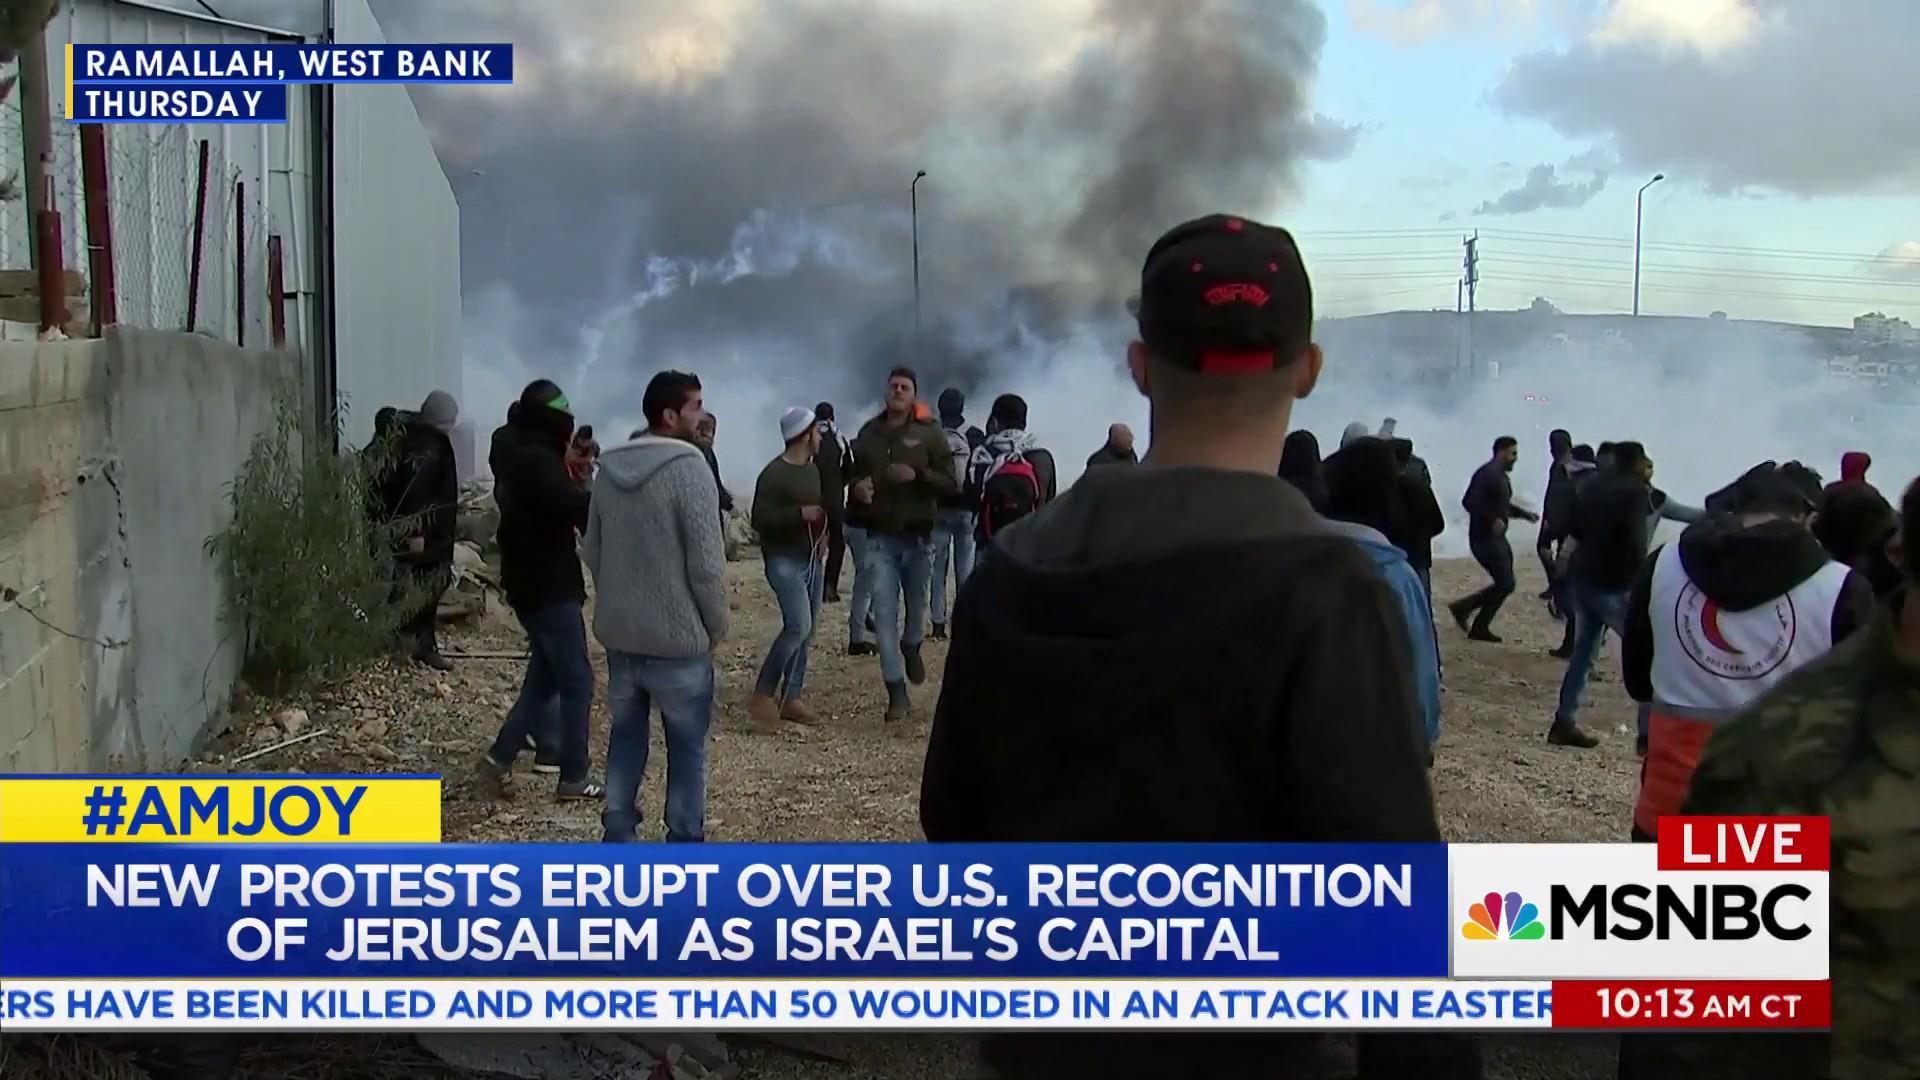 World leaders condemn Trump's Jerusalem decision